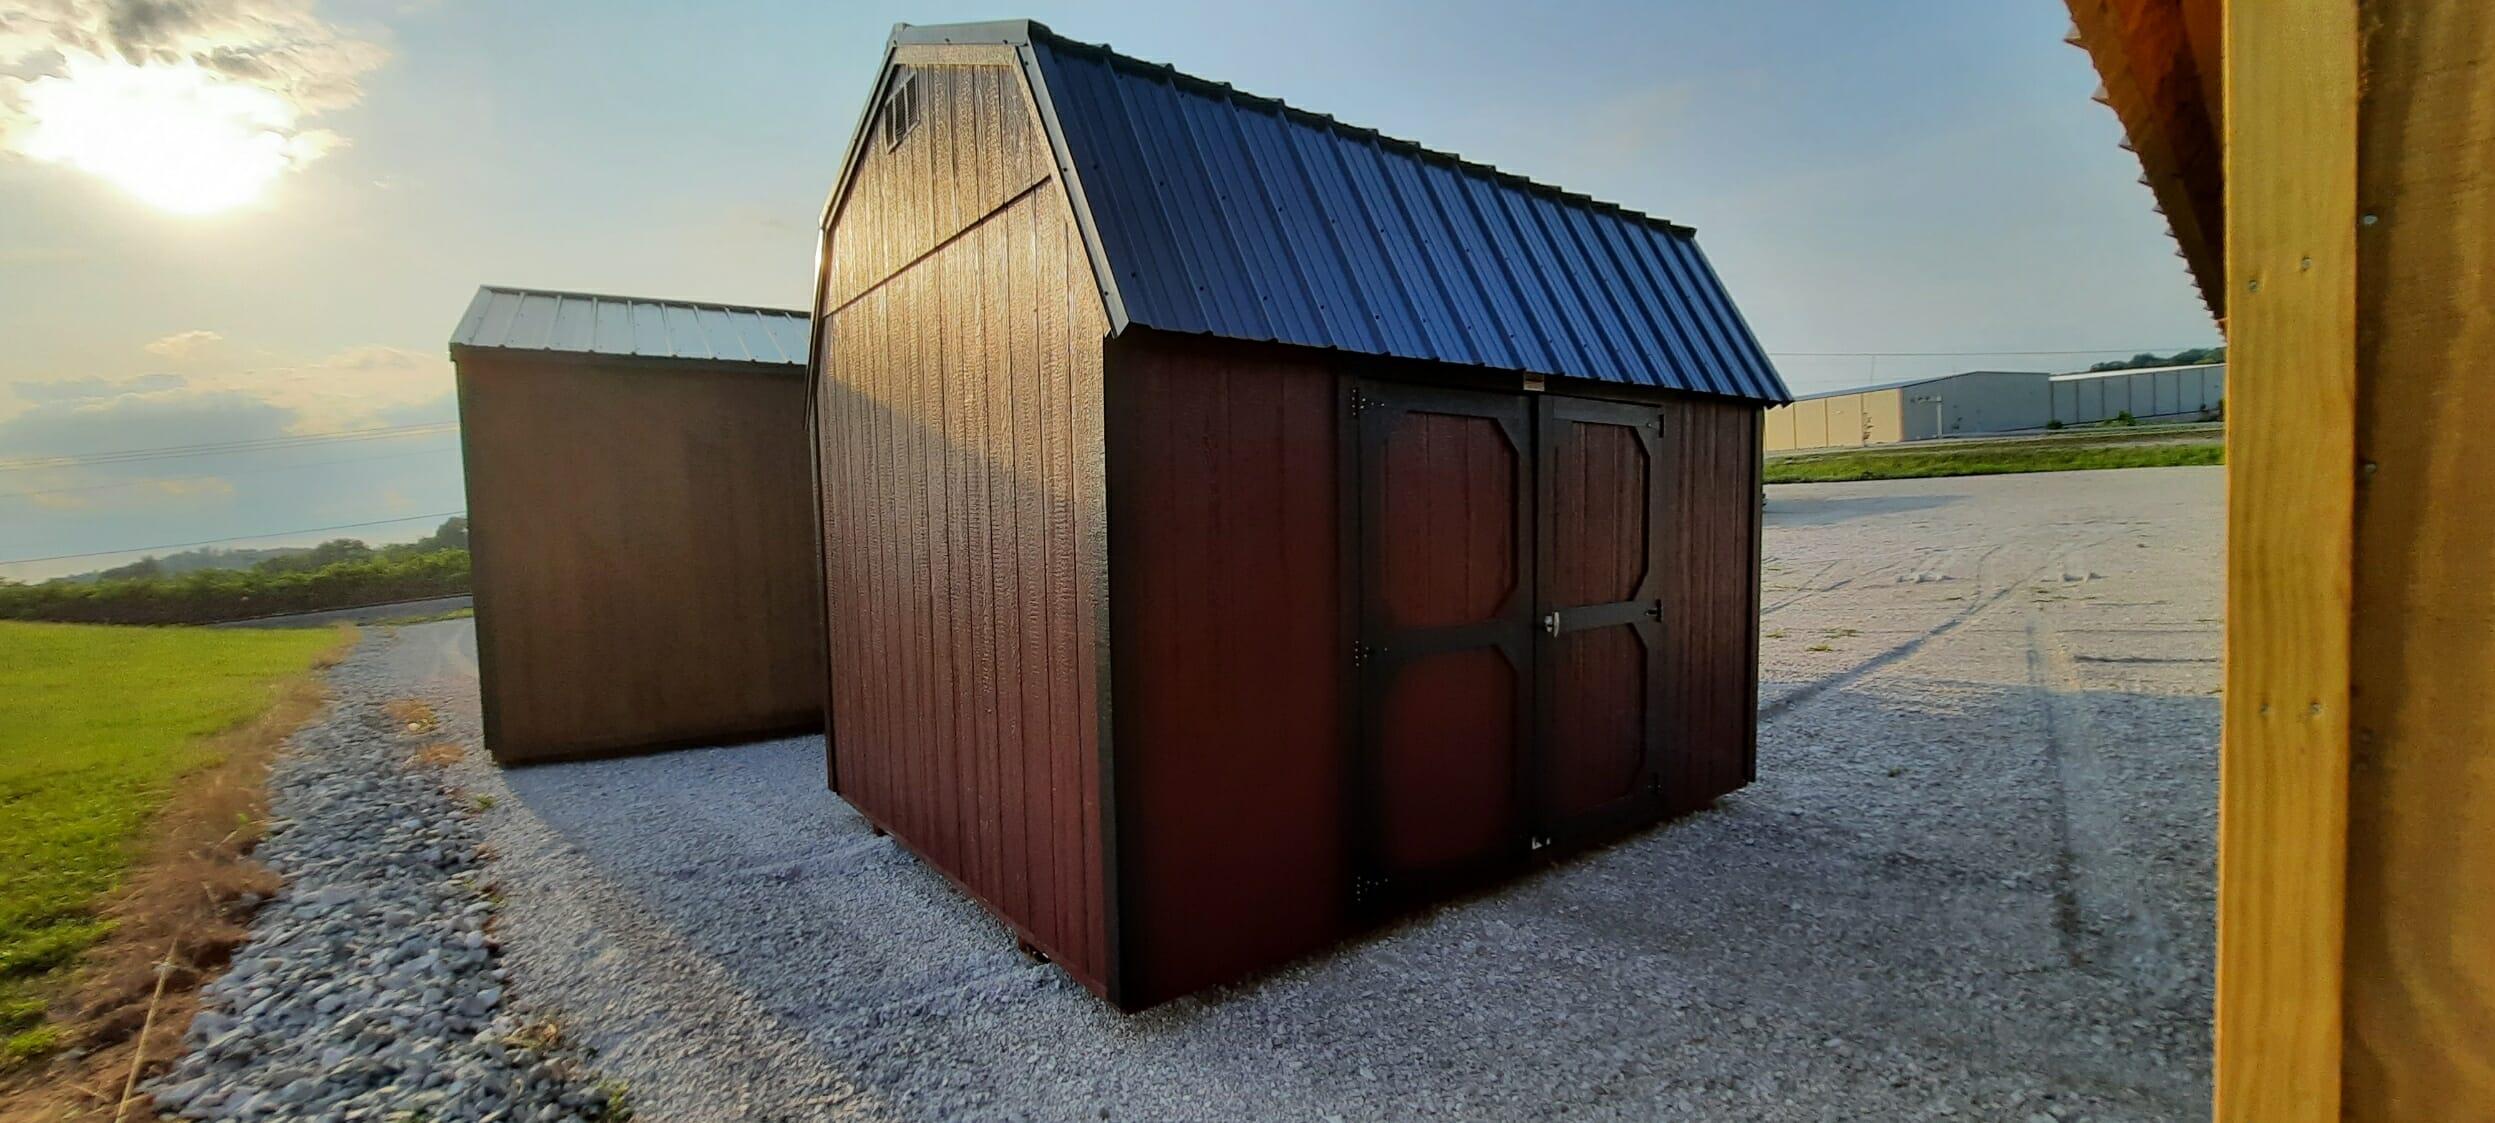 10 x 12 Lofted Building- PIN845